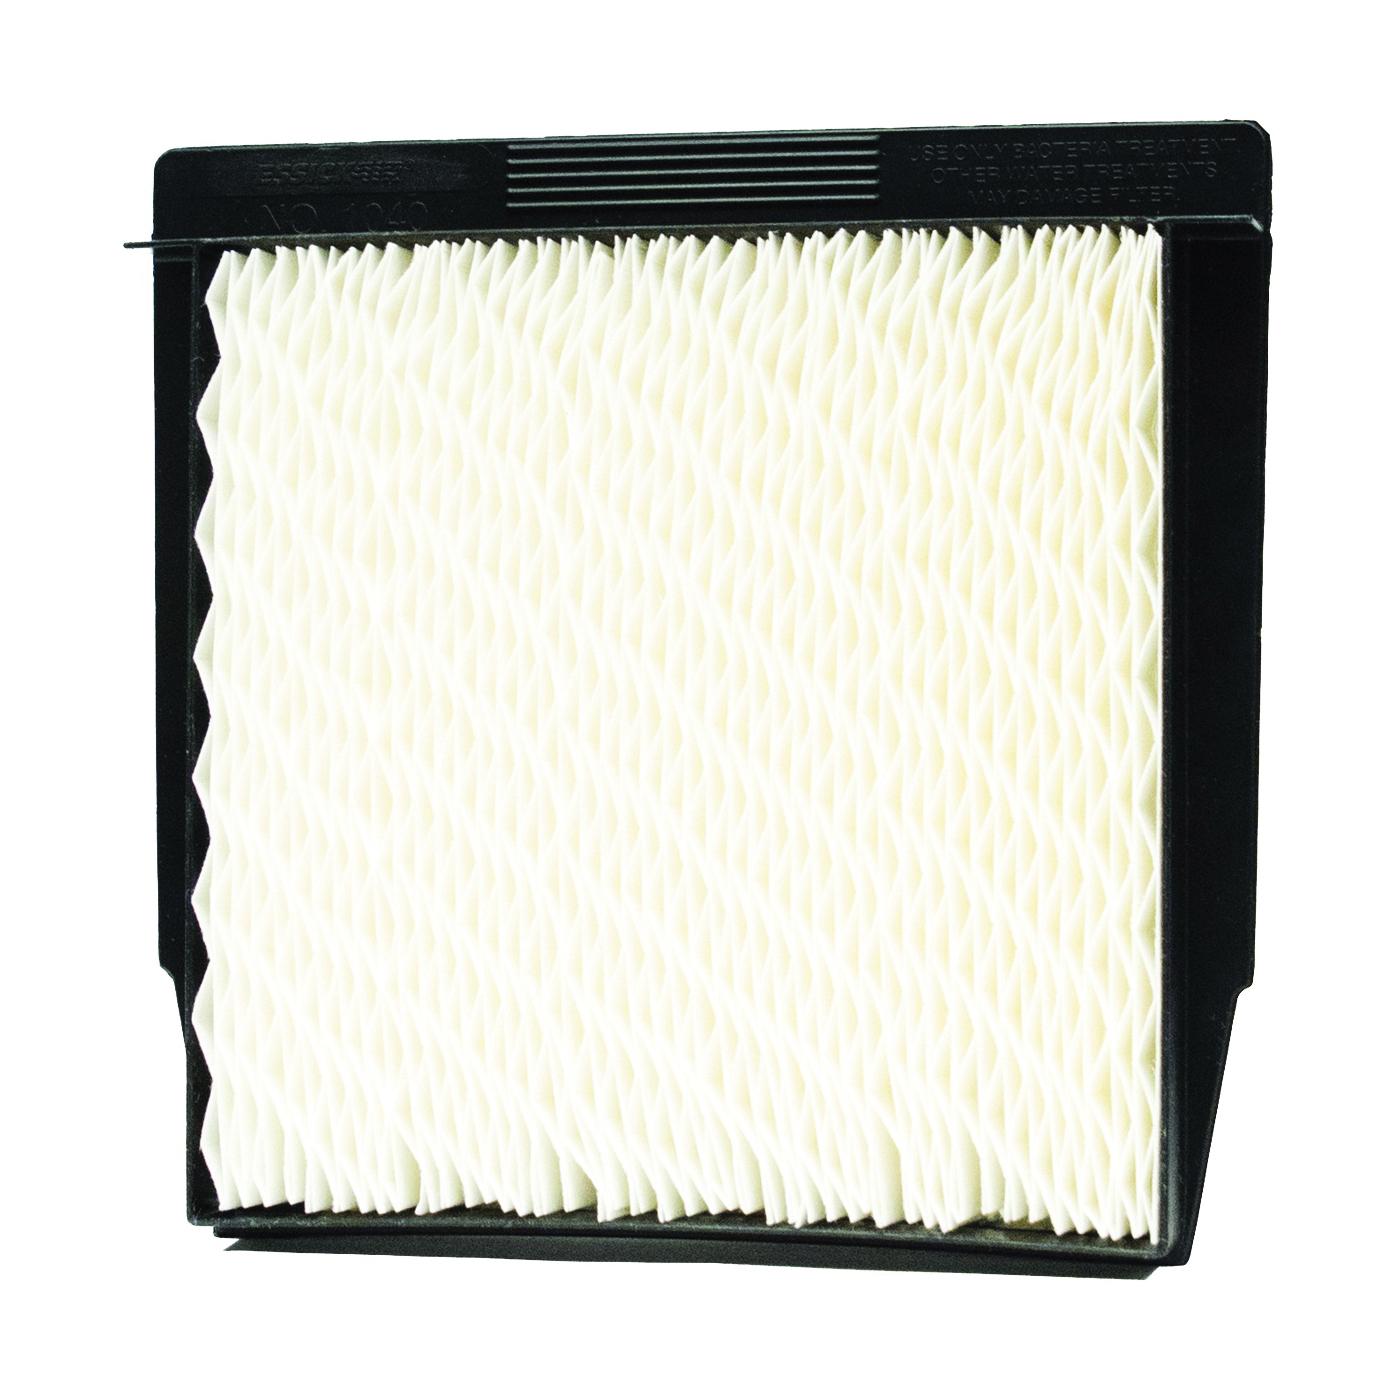 Picture of EssickAir SGL1040 Wick Filter, 9 in L, 1-1/2 in W, Plastic Frame, White